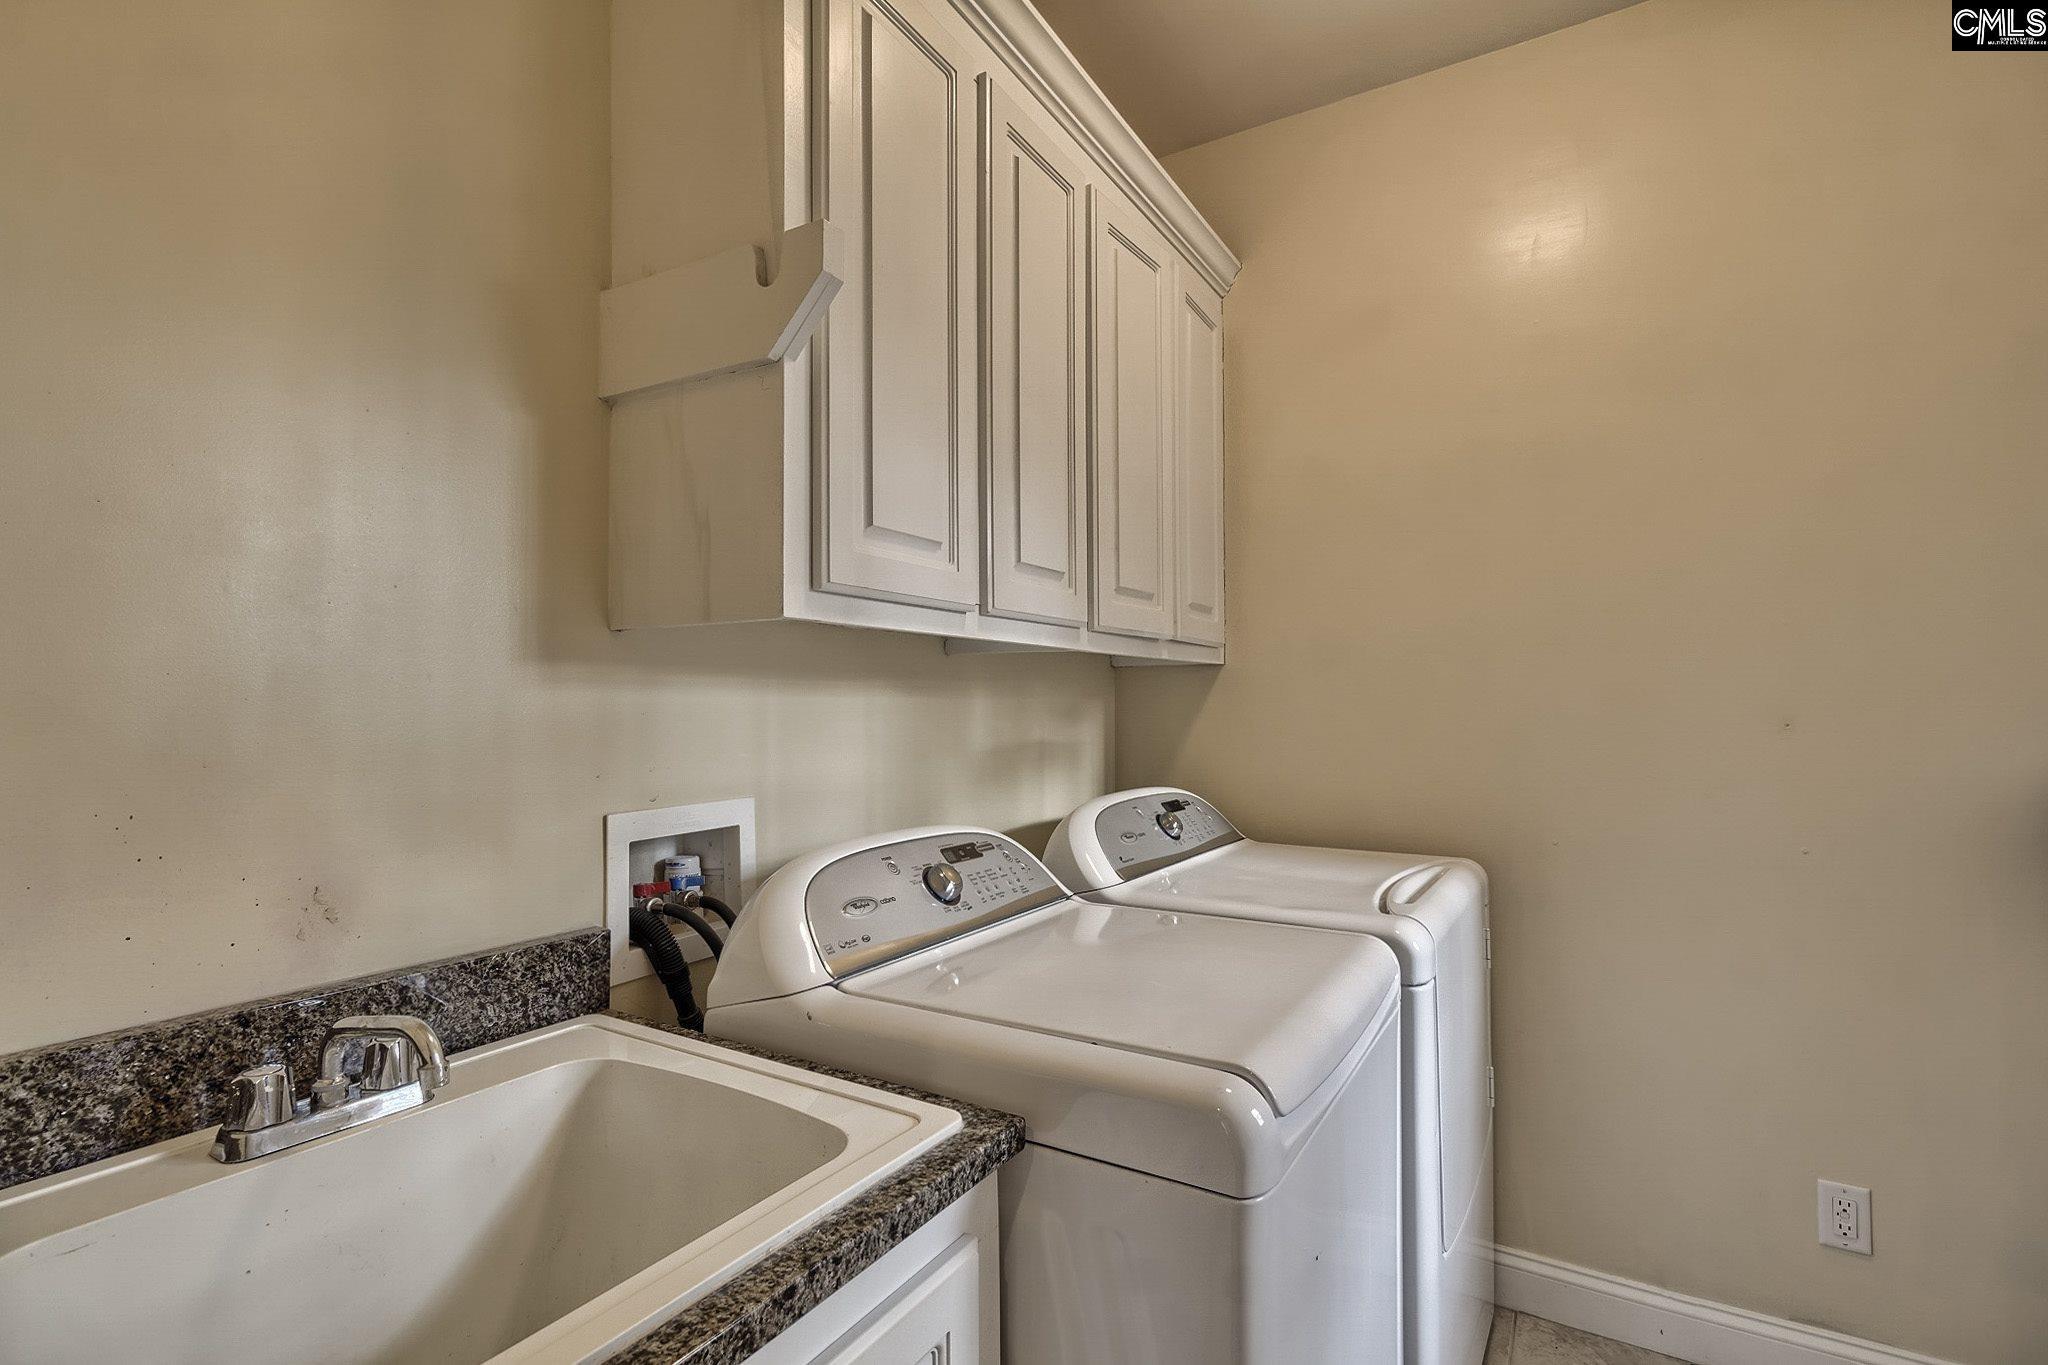 217  Wren Creek Blythewood, SC 29016